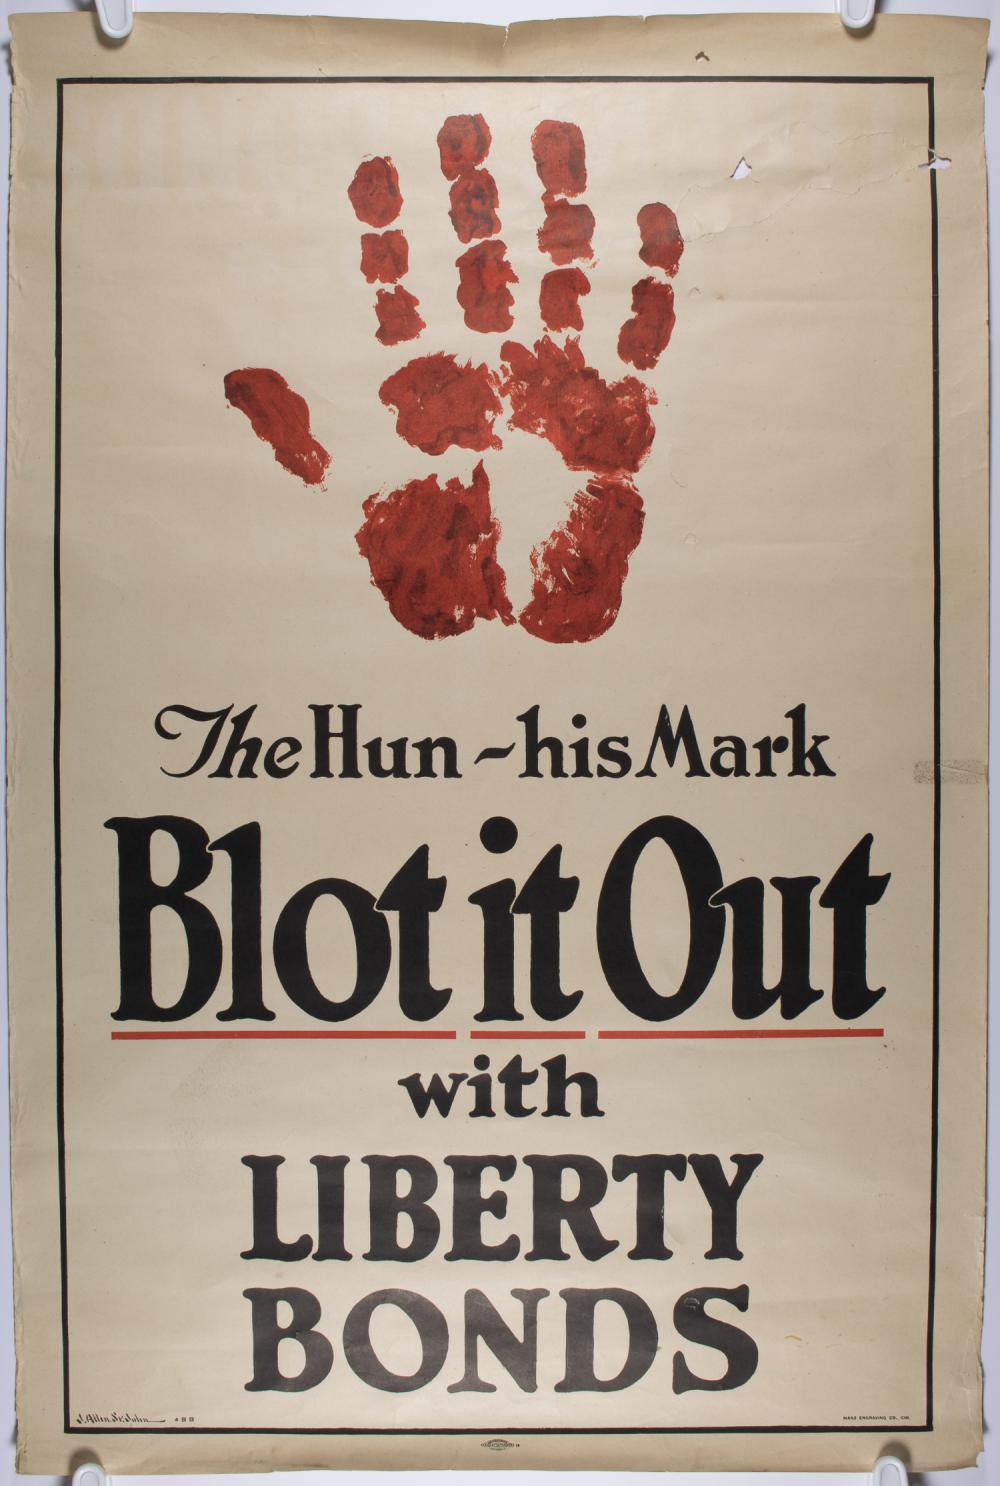 'THE HUN - HIS MARK' WORLD WAR I POSTER